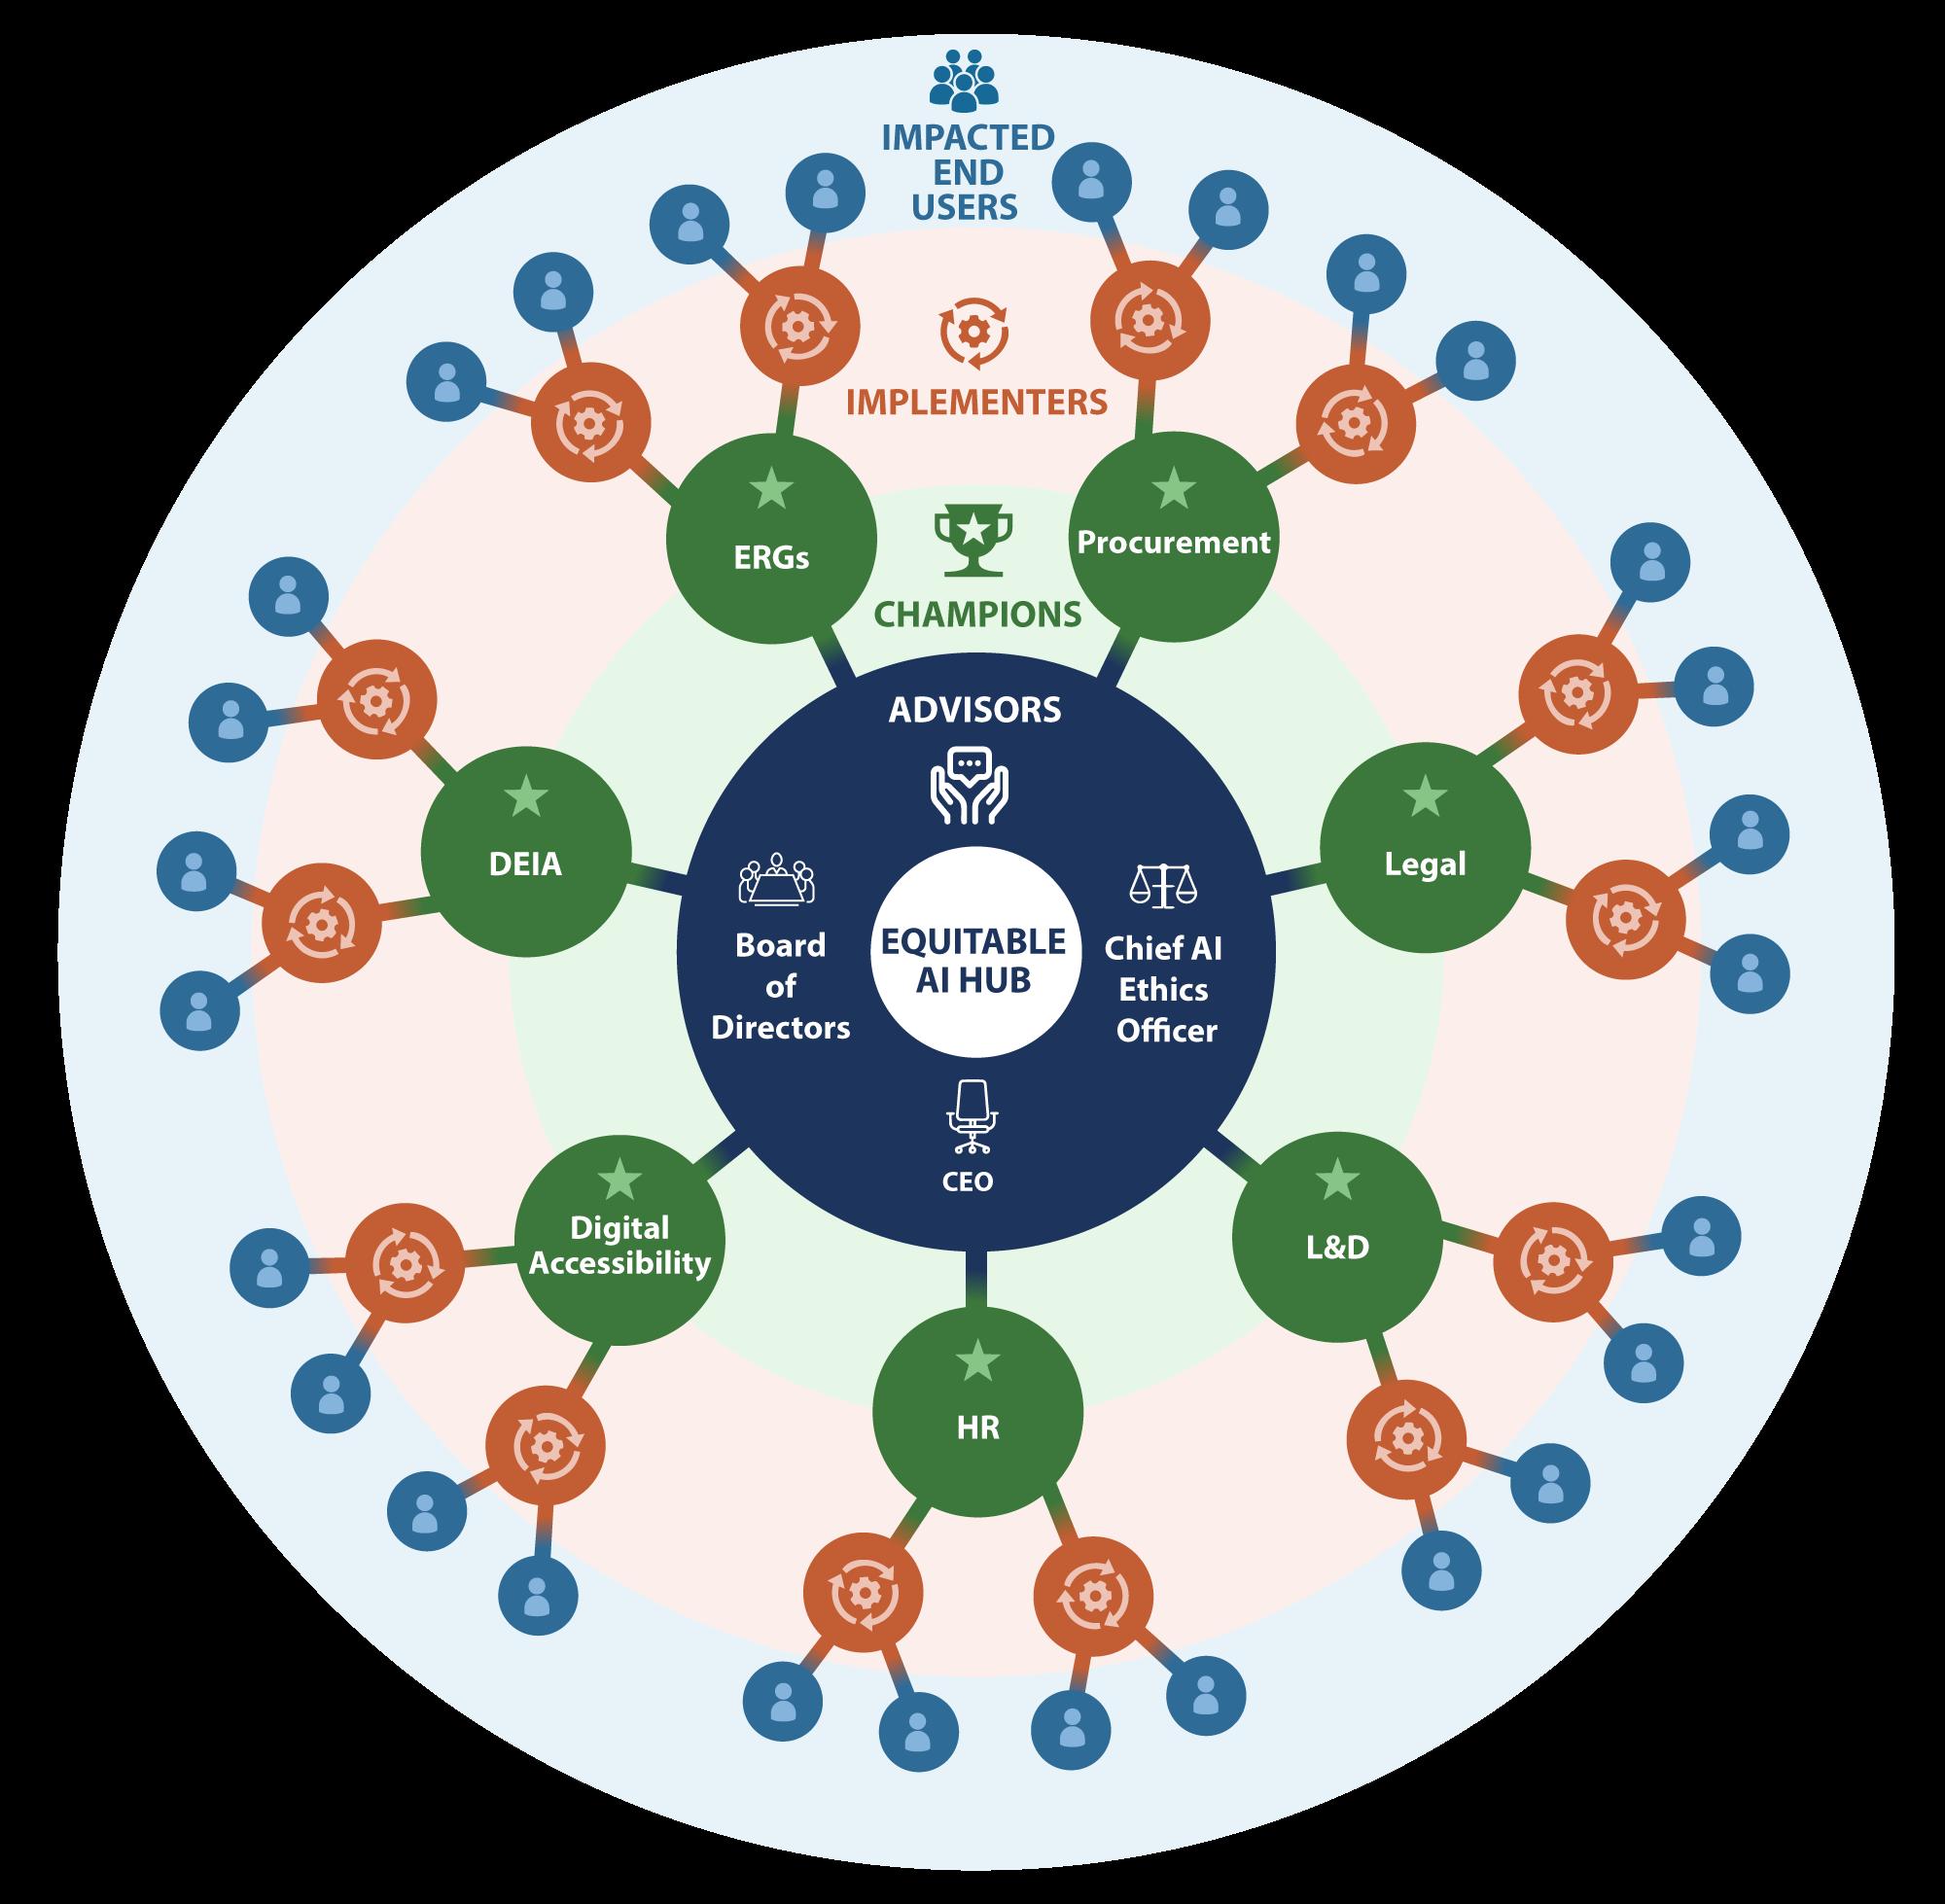 Equitable AI Hub & Spoke Model Infographic